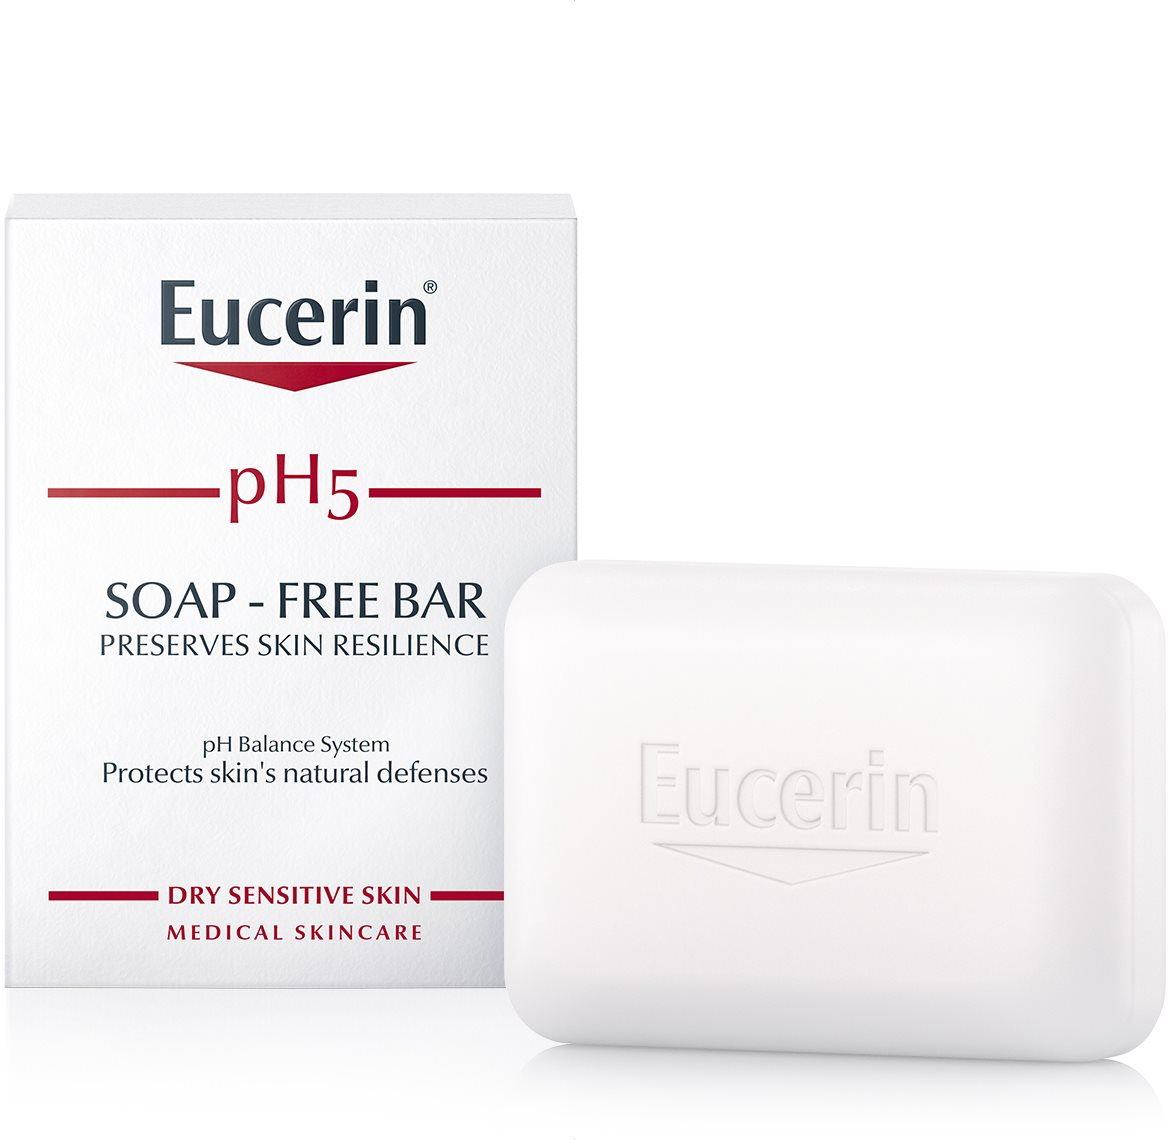 Ph5 Soap Free Bar Soap Free Bar For Dry Sensitive Skin